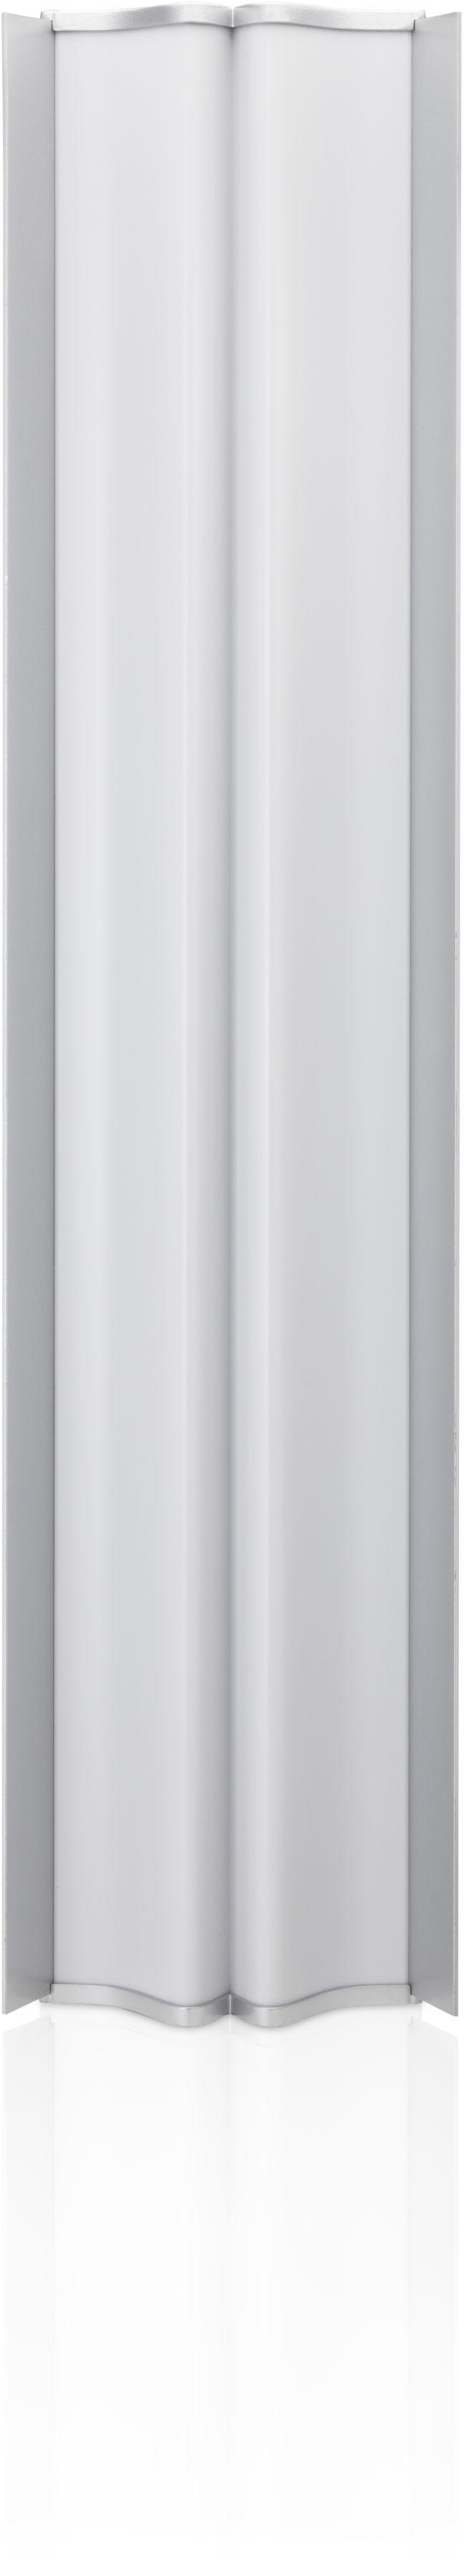 Ubiquiti Networks airMAX ac 2x2 antena 21 dBi